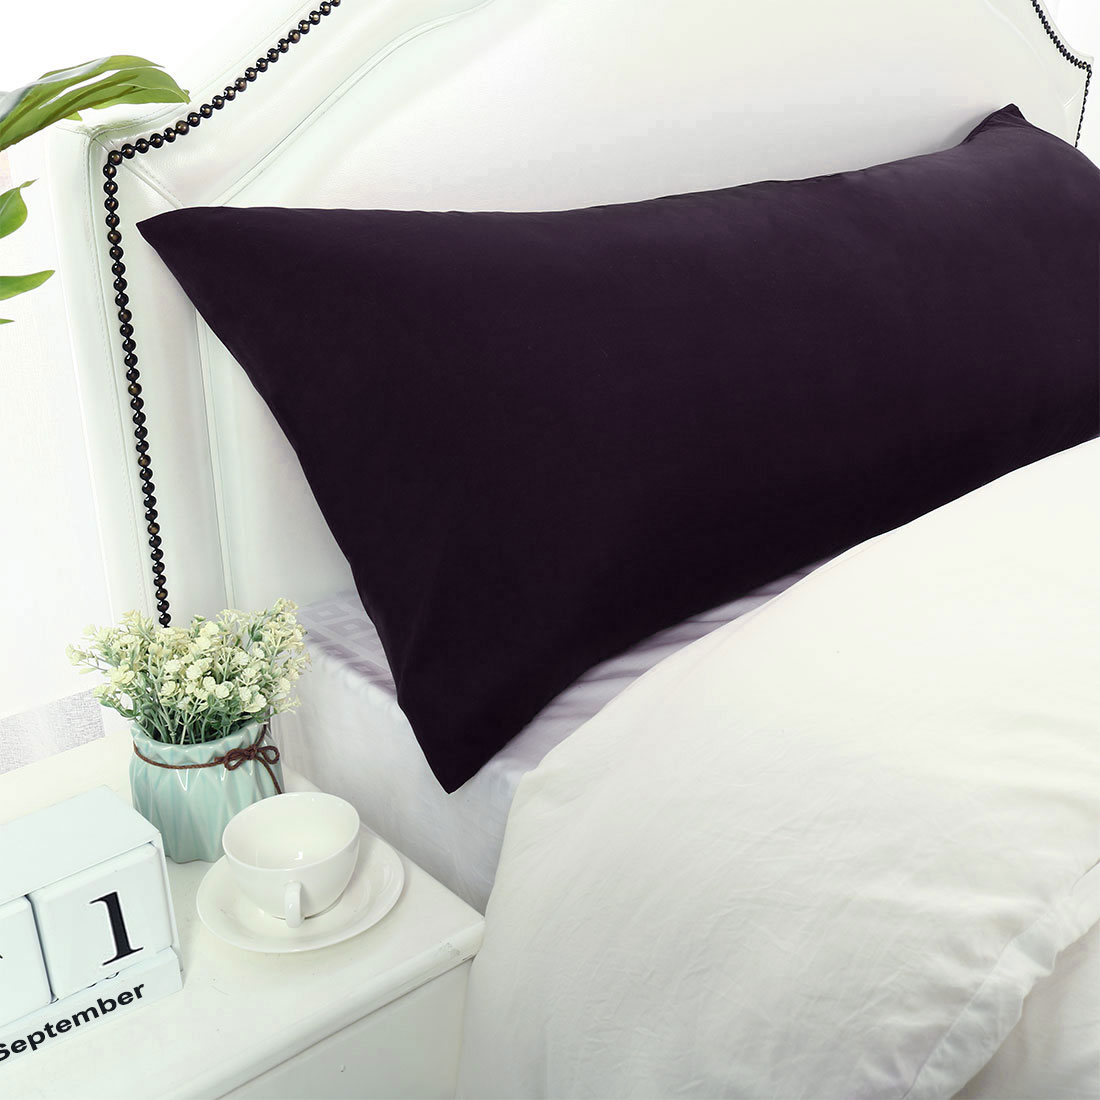 "Body Pillow Cases 1800 Microfiber Soft Bolster Pillow Cover Eggplant 20x72"""